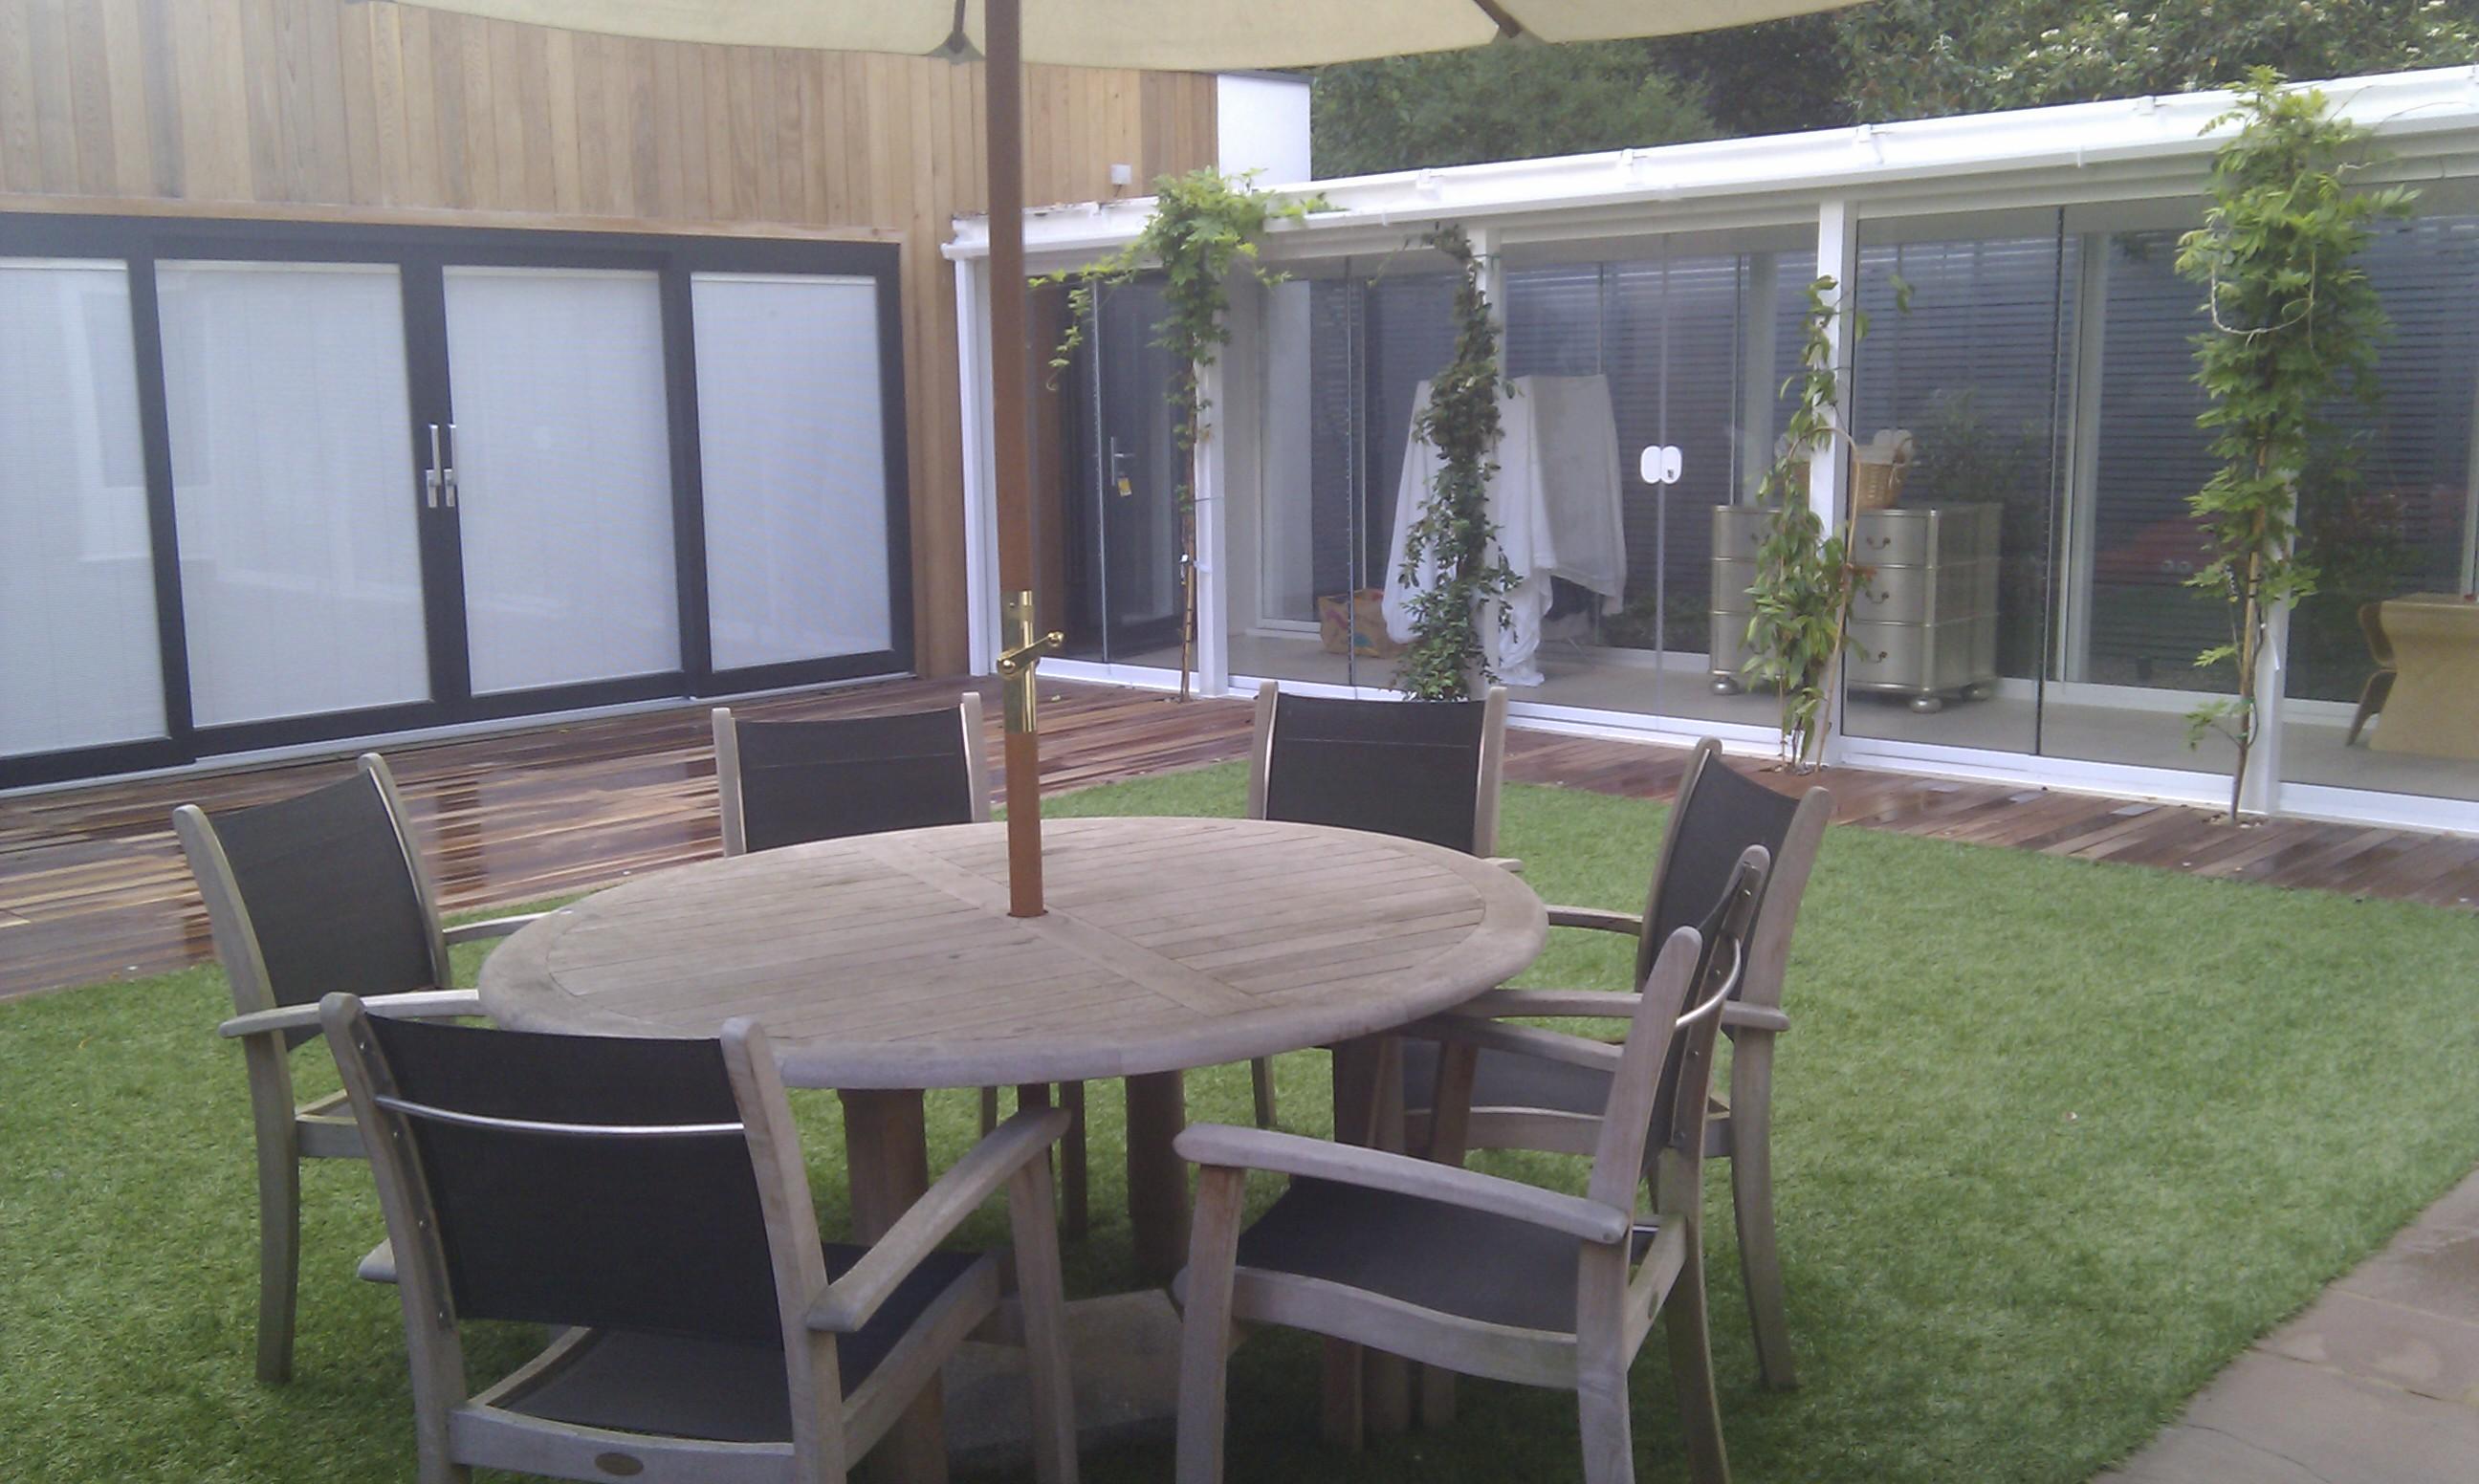 modern garden design london slatted grey privacy screen sandstone paving easy grass balau hardwood decking (28)